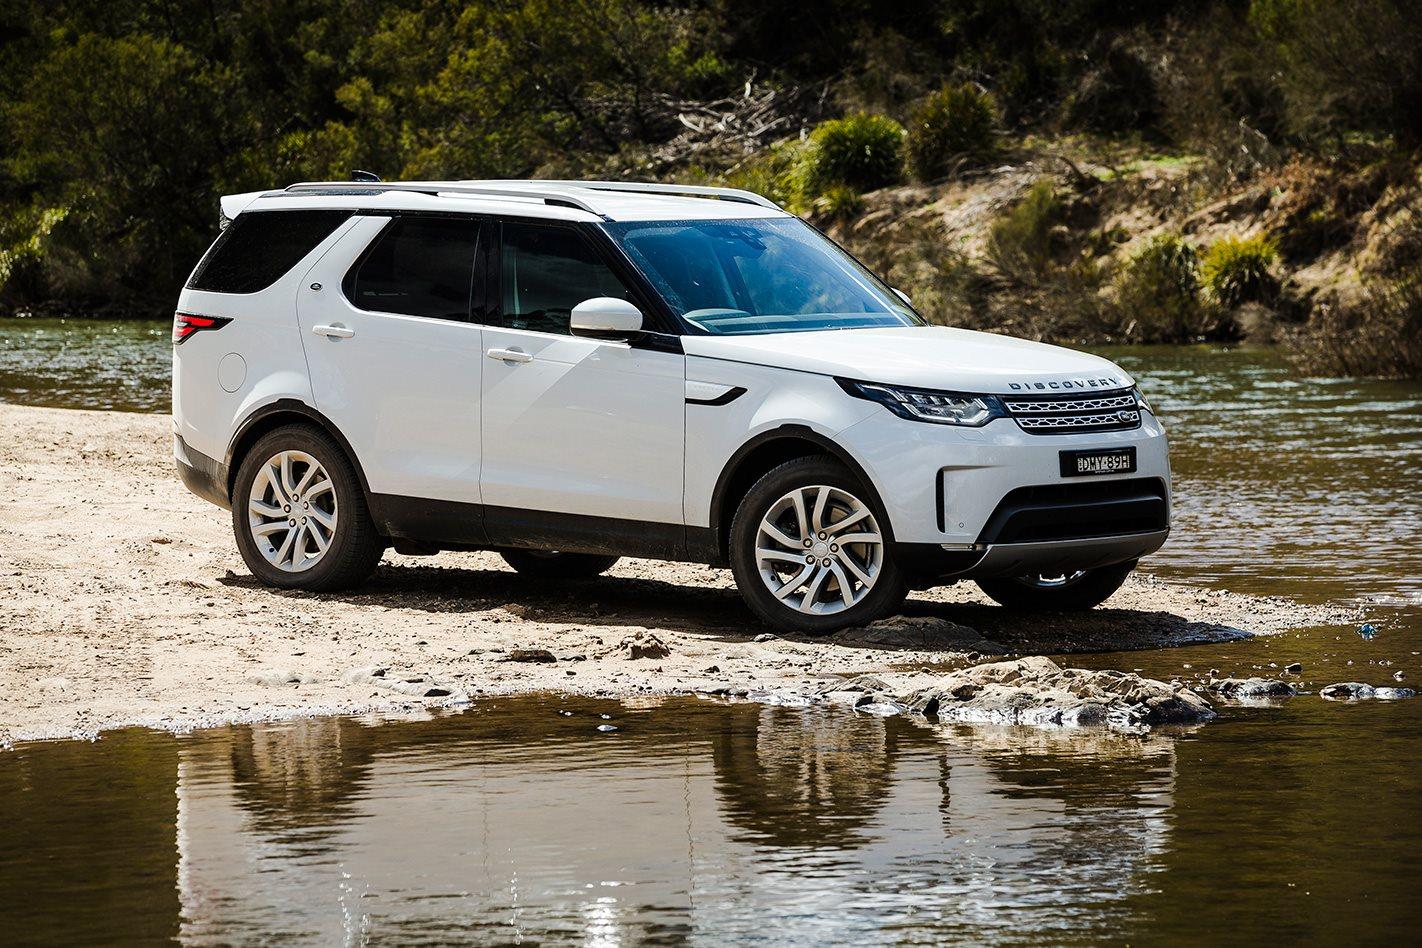 2017 Land Rover Discovery exterior.jpg